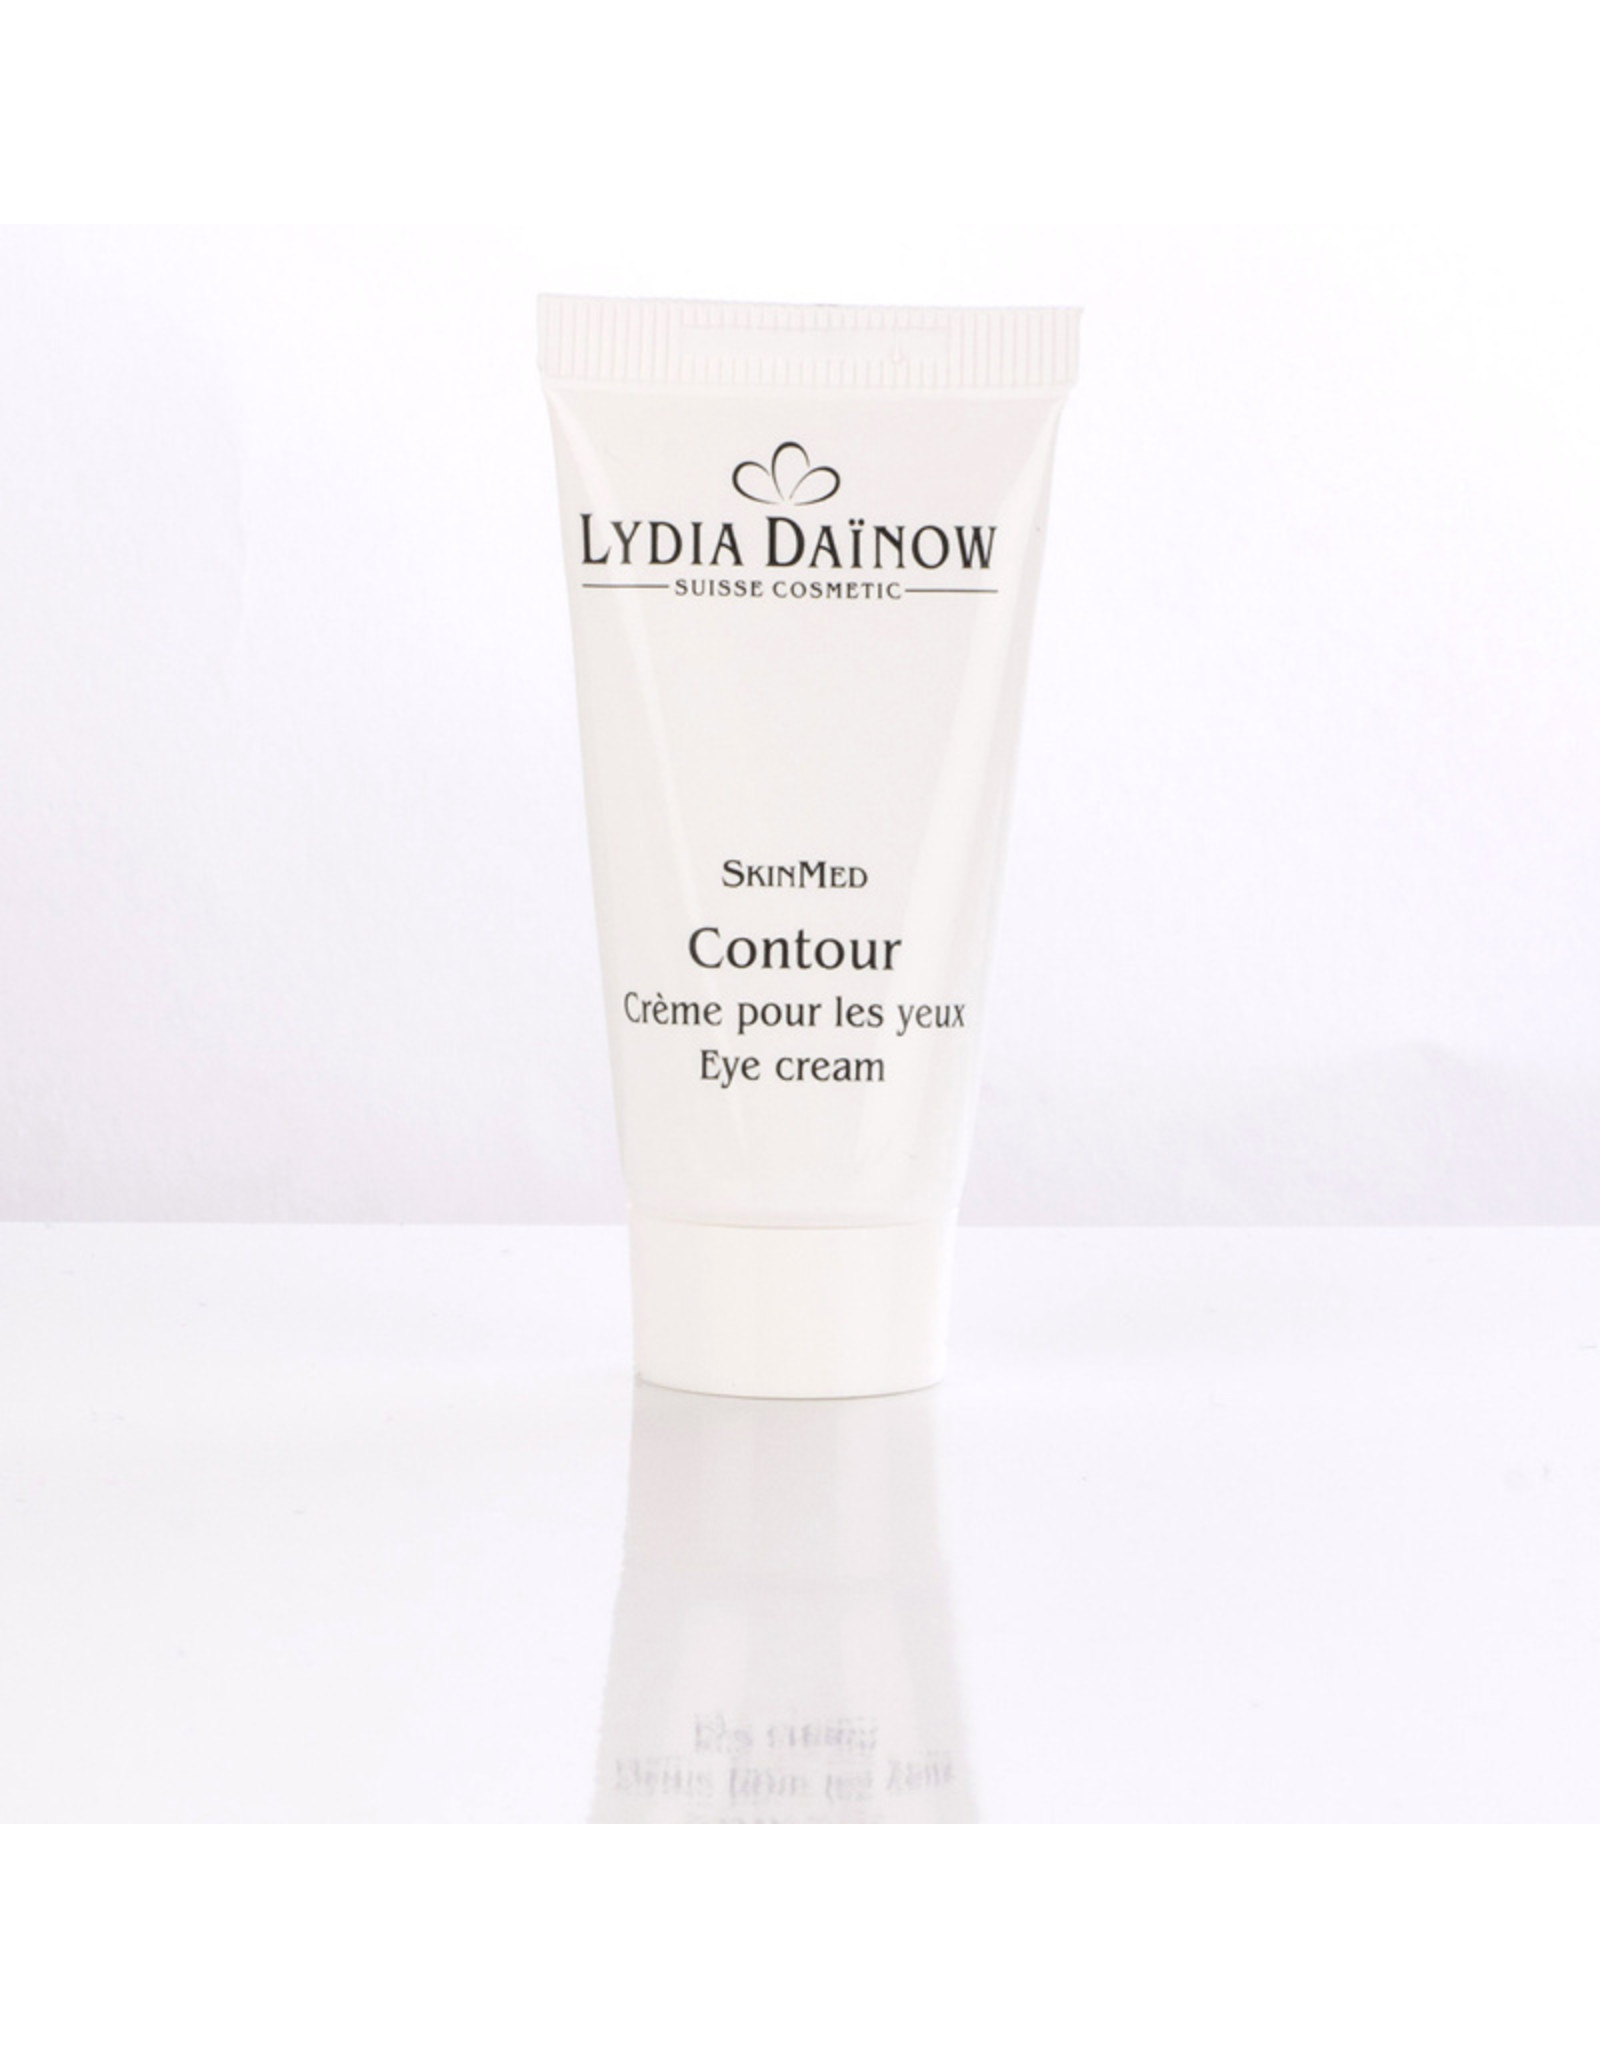 Lydïa Dainow Contour - Eye cream